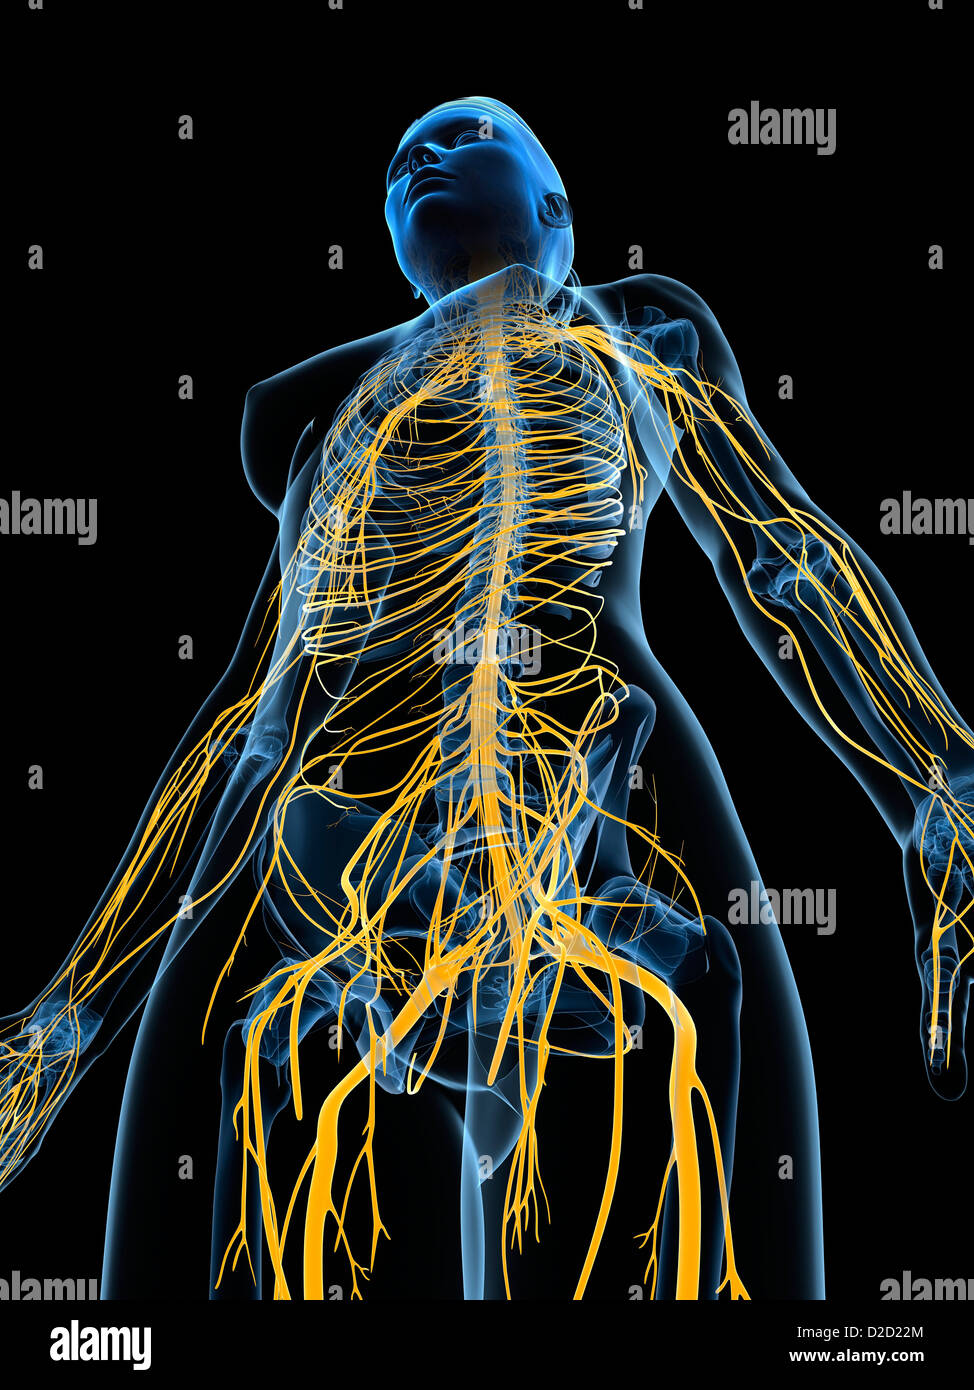 Female nervous system computer artwork - Stock Image